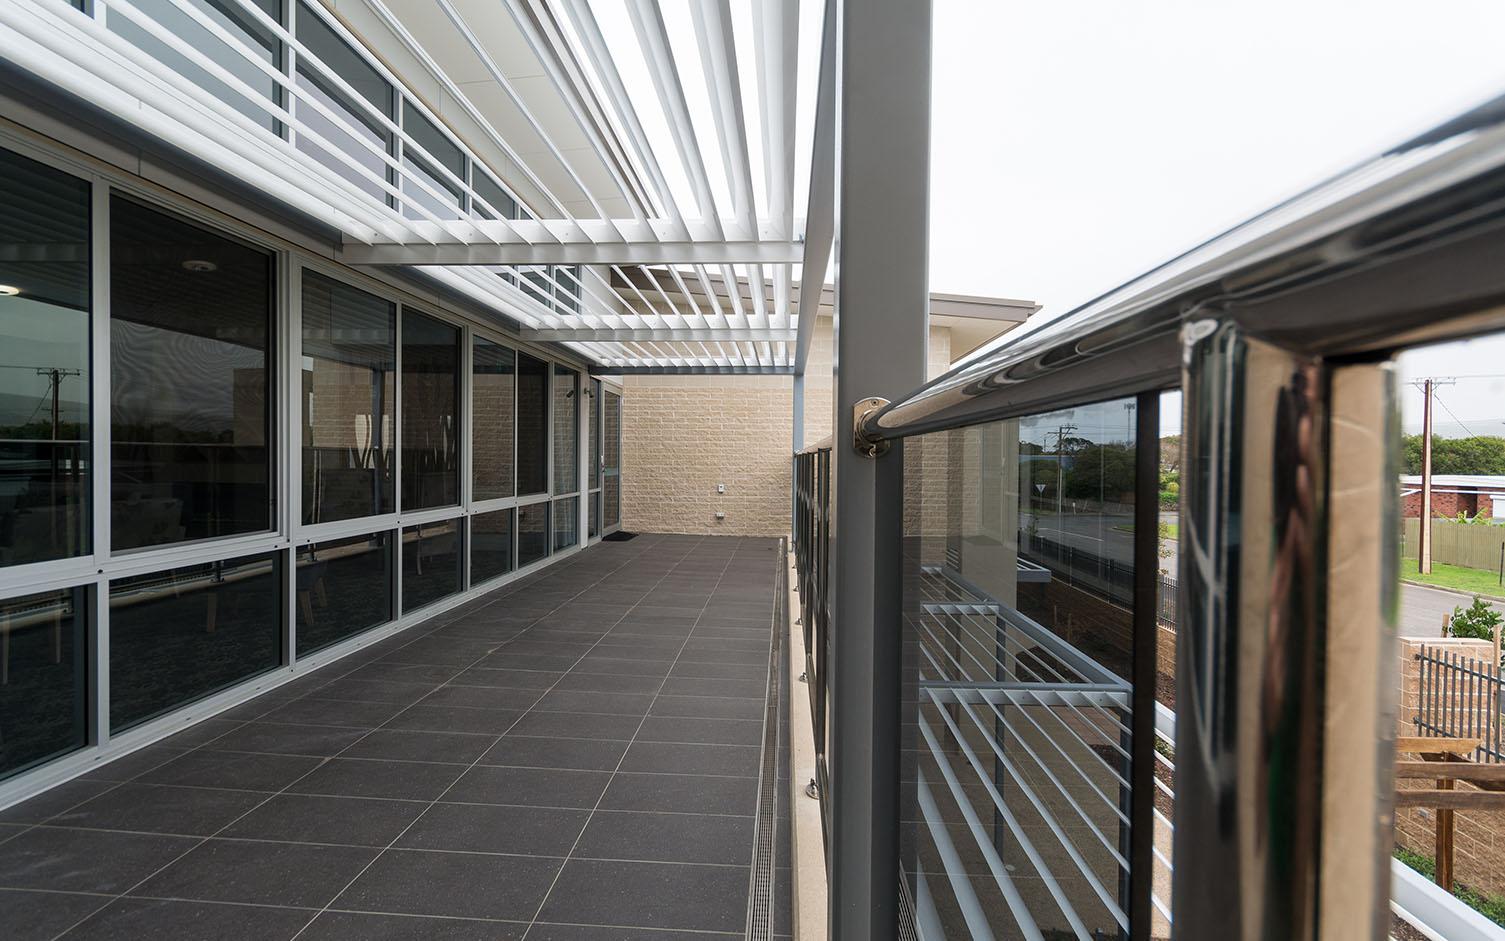 https://ggtiling.com.au/wp-content/uploads/2016/06/Resthaven-Port-Elliot-G-G-Tiling_0000_Resthaven-Pt-Elliot-balcony.jpg